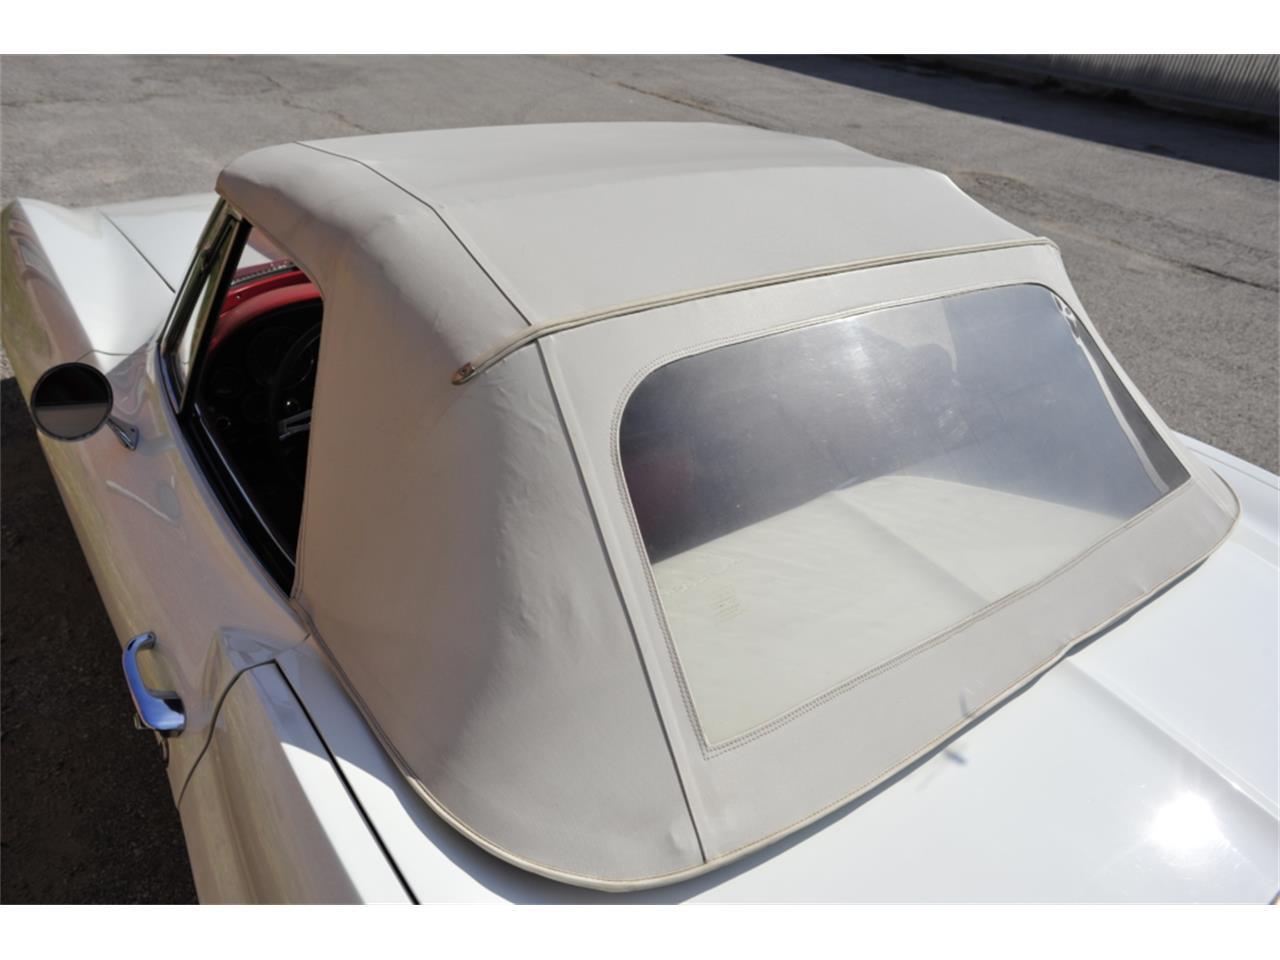 Large Picture of '67 Corvette located in Missouri - $129,995.00 - PZ9R